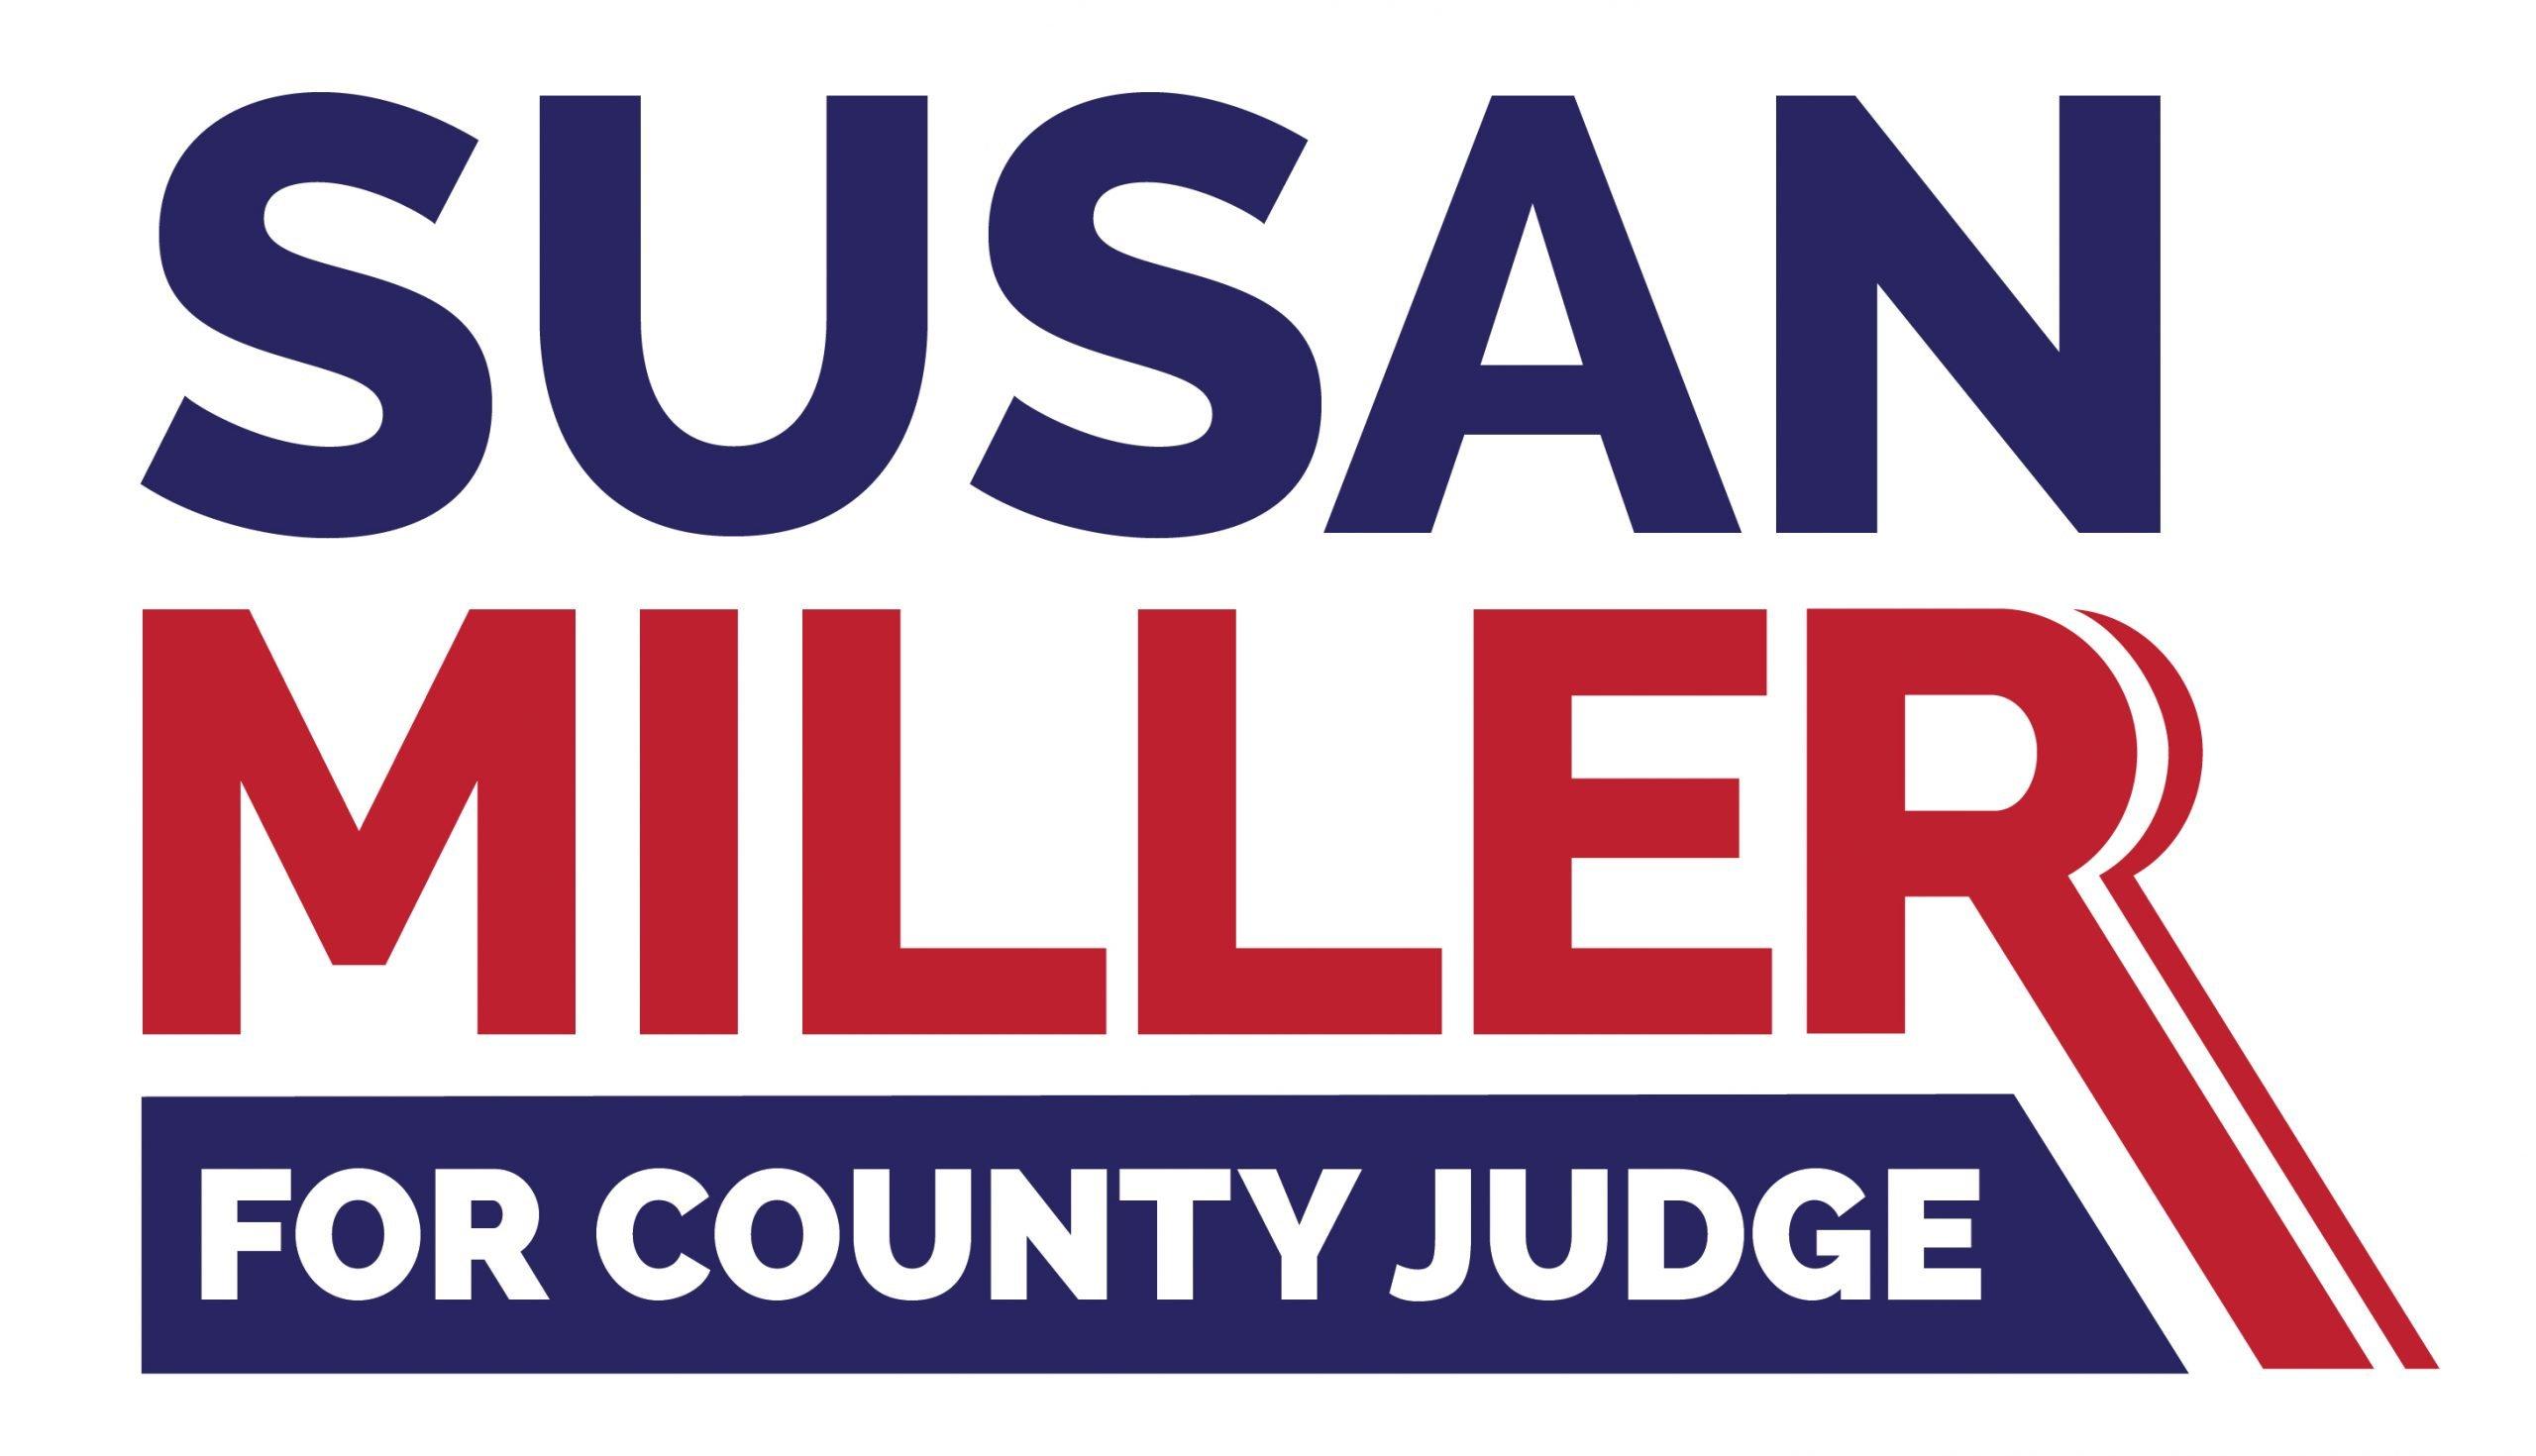 Miller Campaign Sign